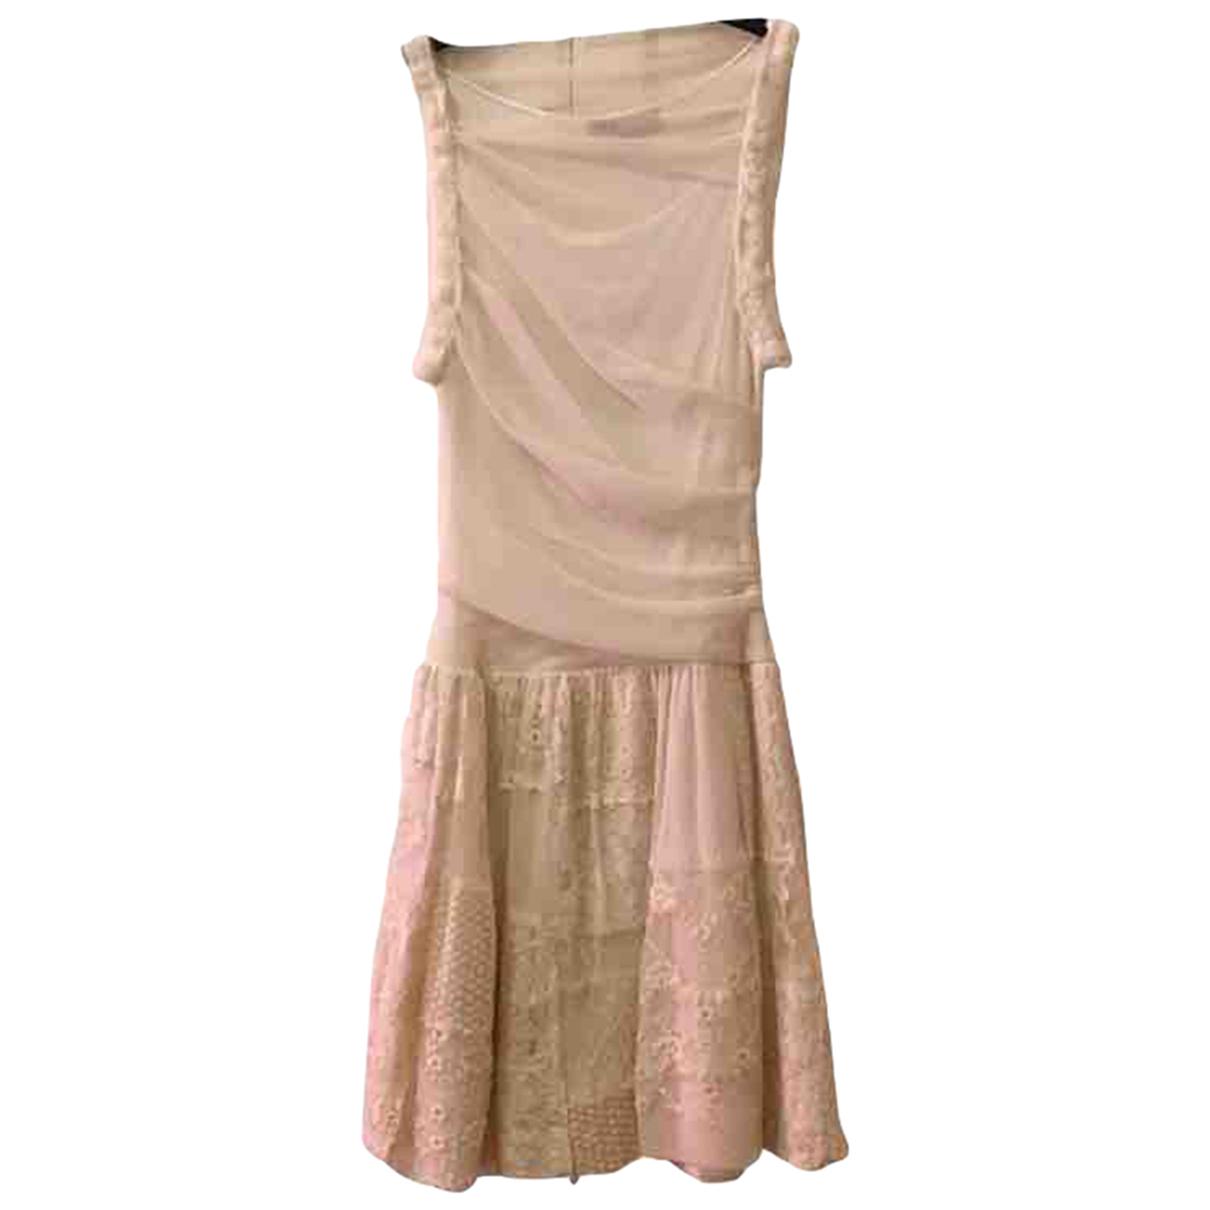 Maje \N Kleid in  Beige Baumwolle